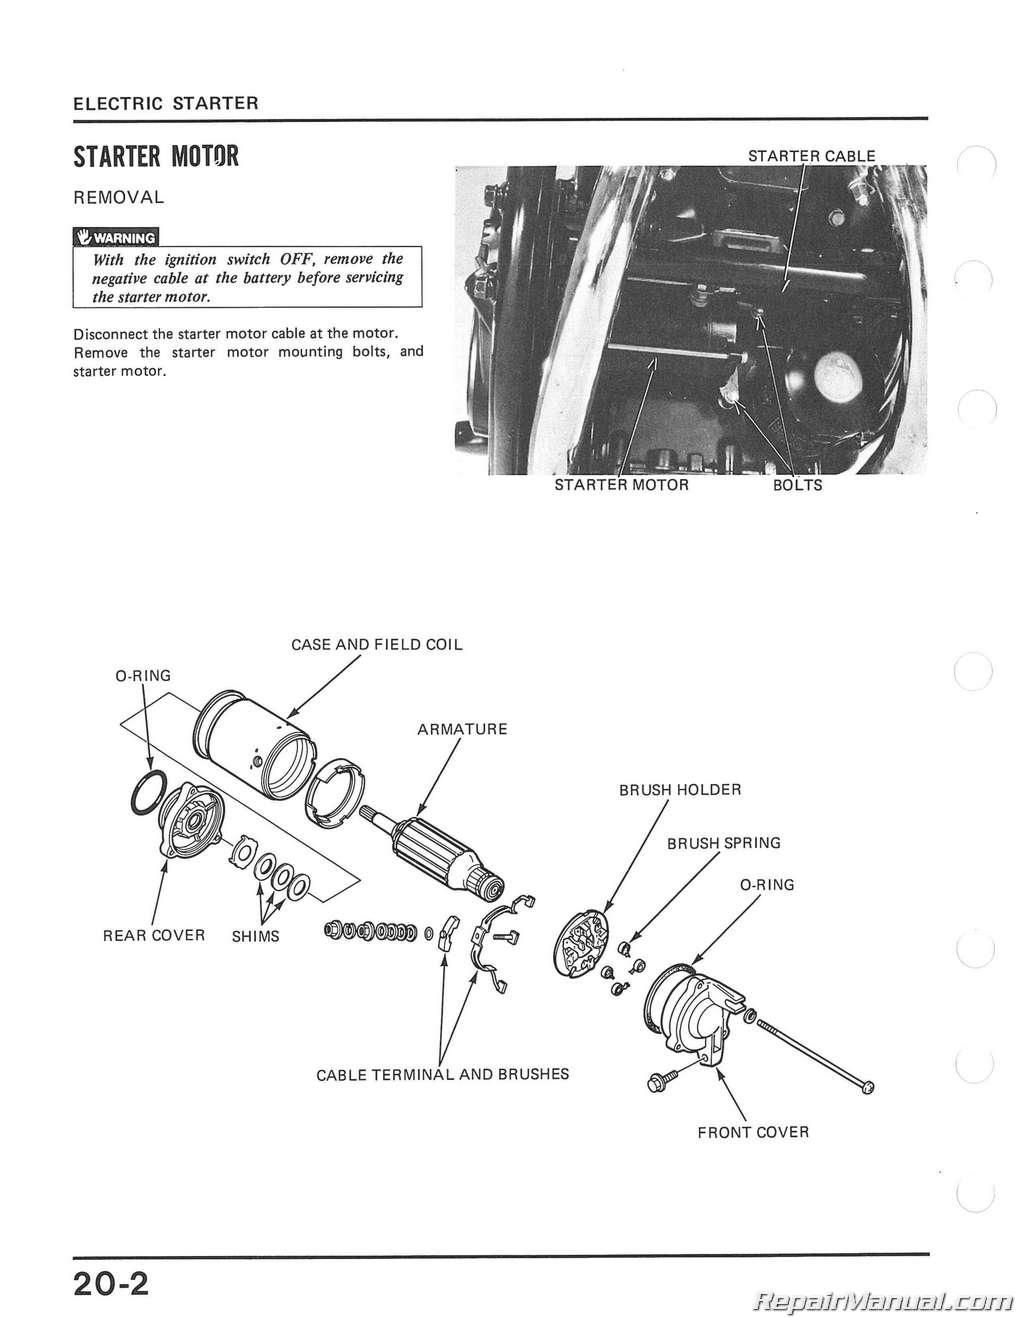 1982 1985 honda vf700c magna vf750s v45 sabre motorcycle 1982 1984 honda vf700c magna vf750s v45 sabre service manual